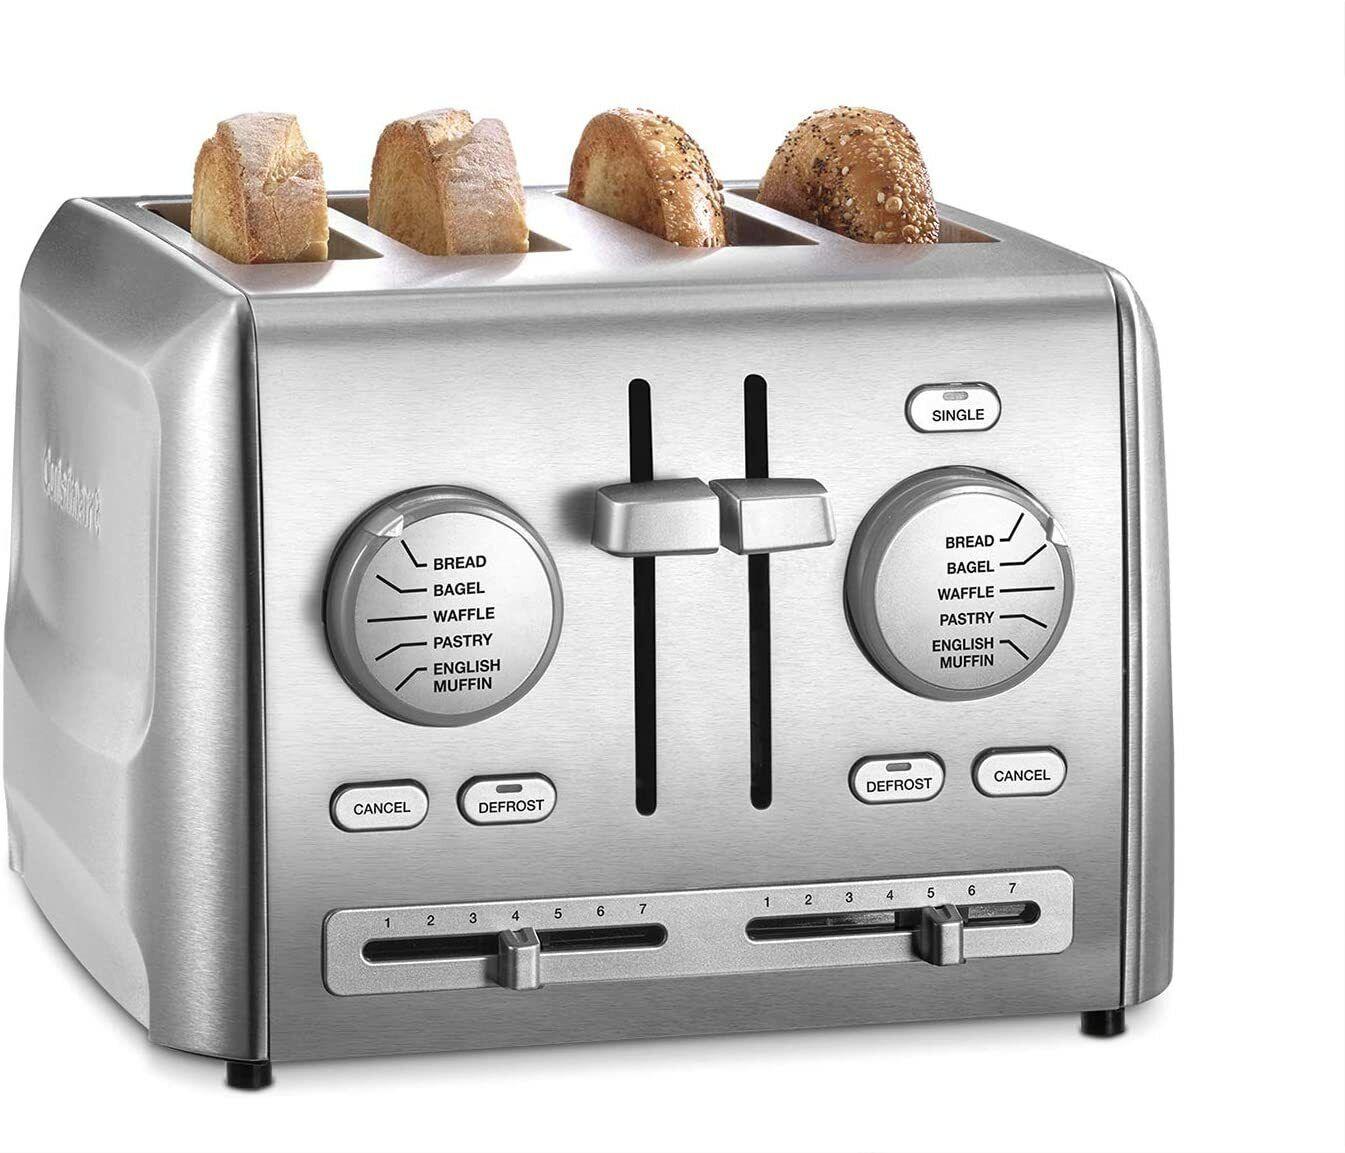 Cuisinart 4-Slice Custom Select Metal Toaster - Stainless Steel